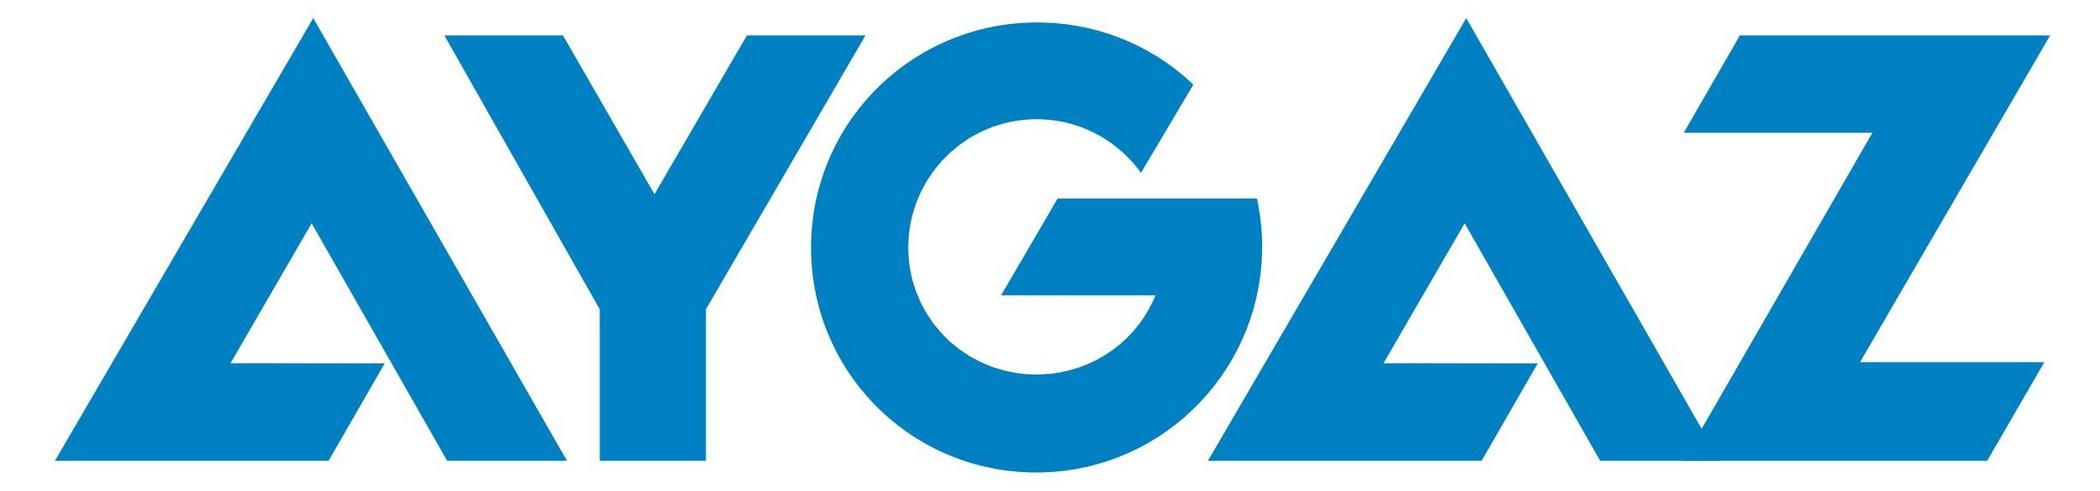 Logo Aygaz PNG - 99648